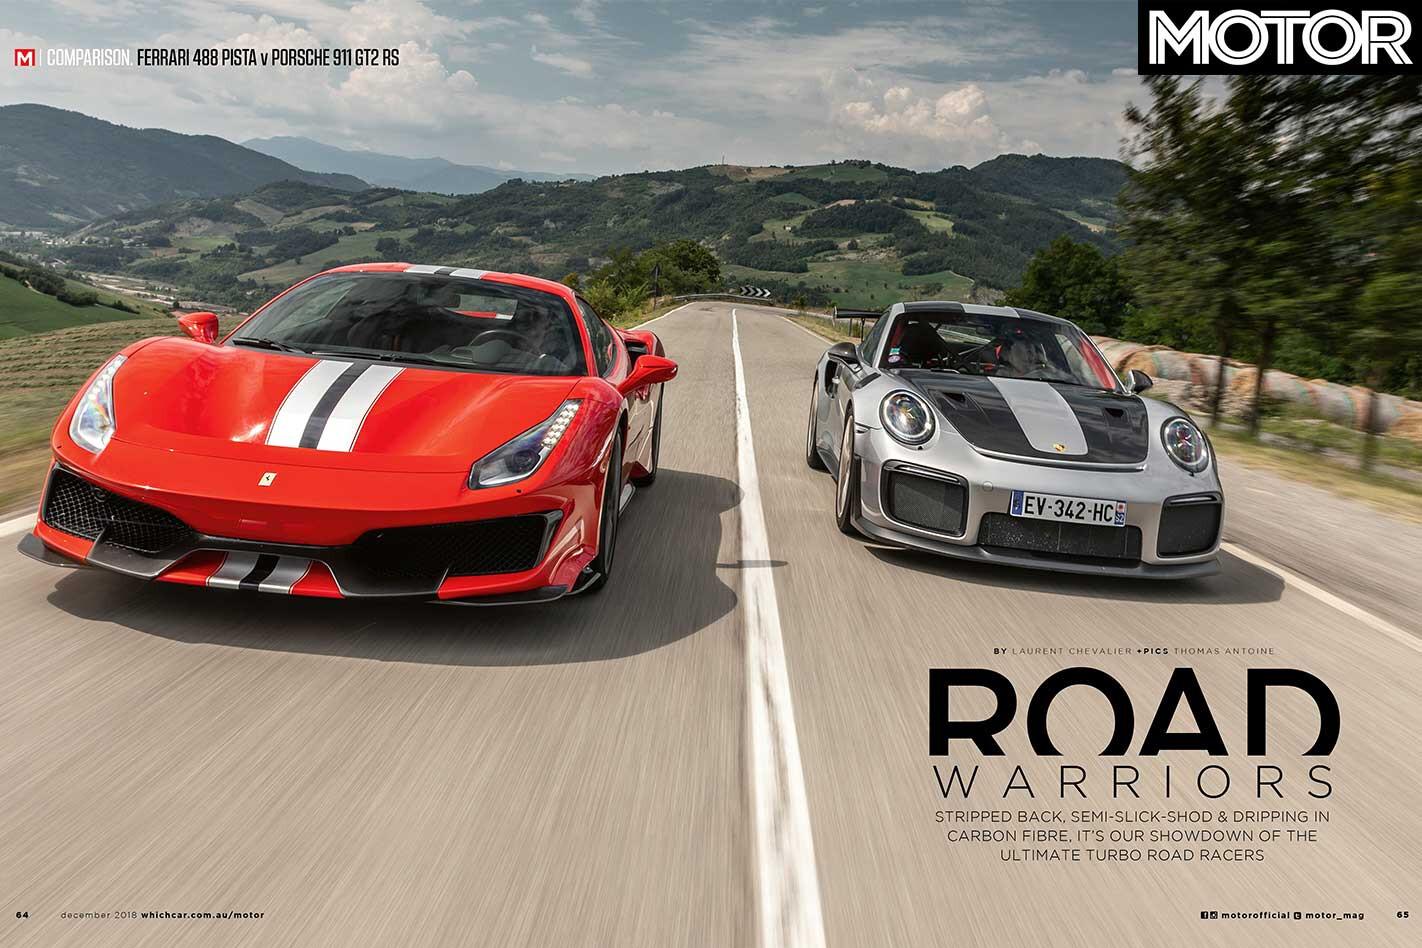 MOTOR Magazine December 2018 Preview Comparison Jpg